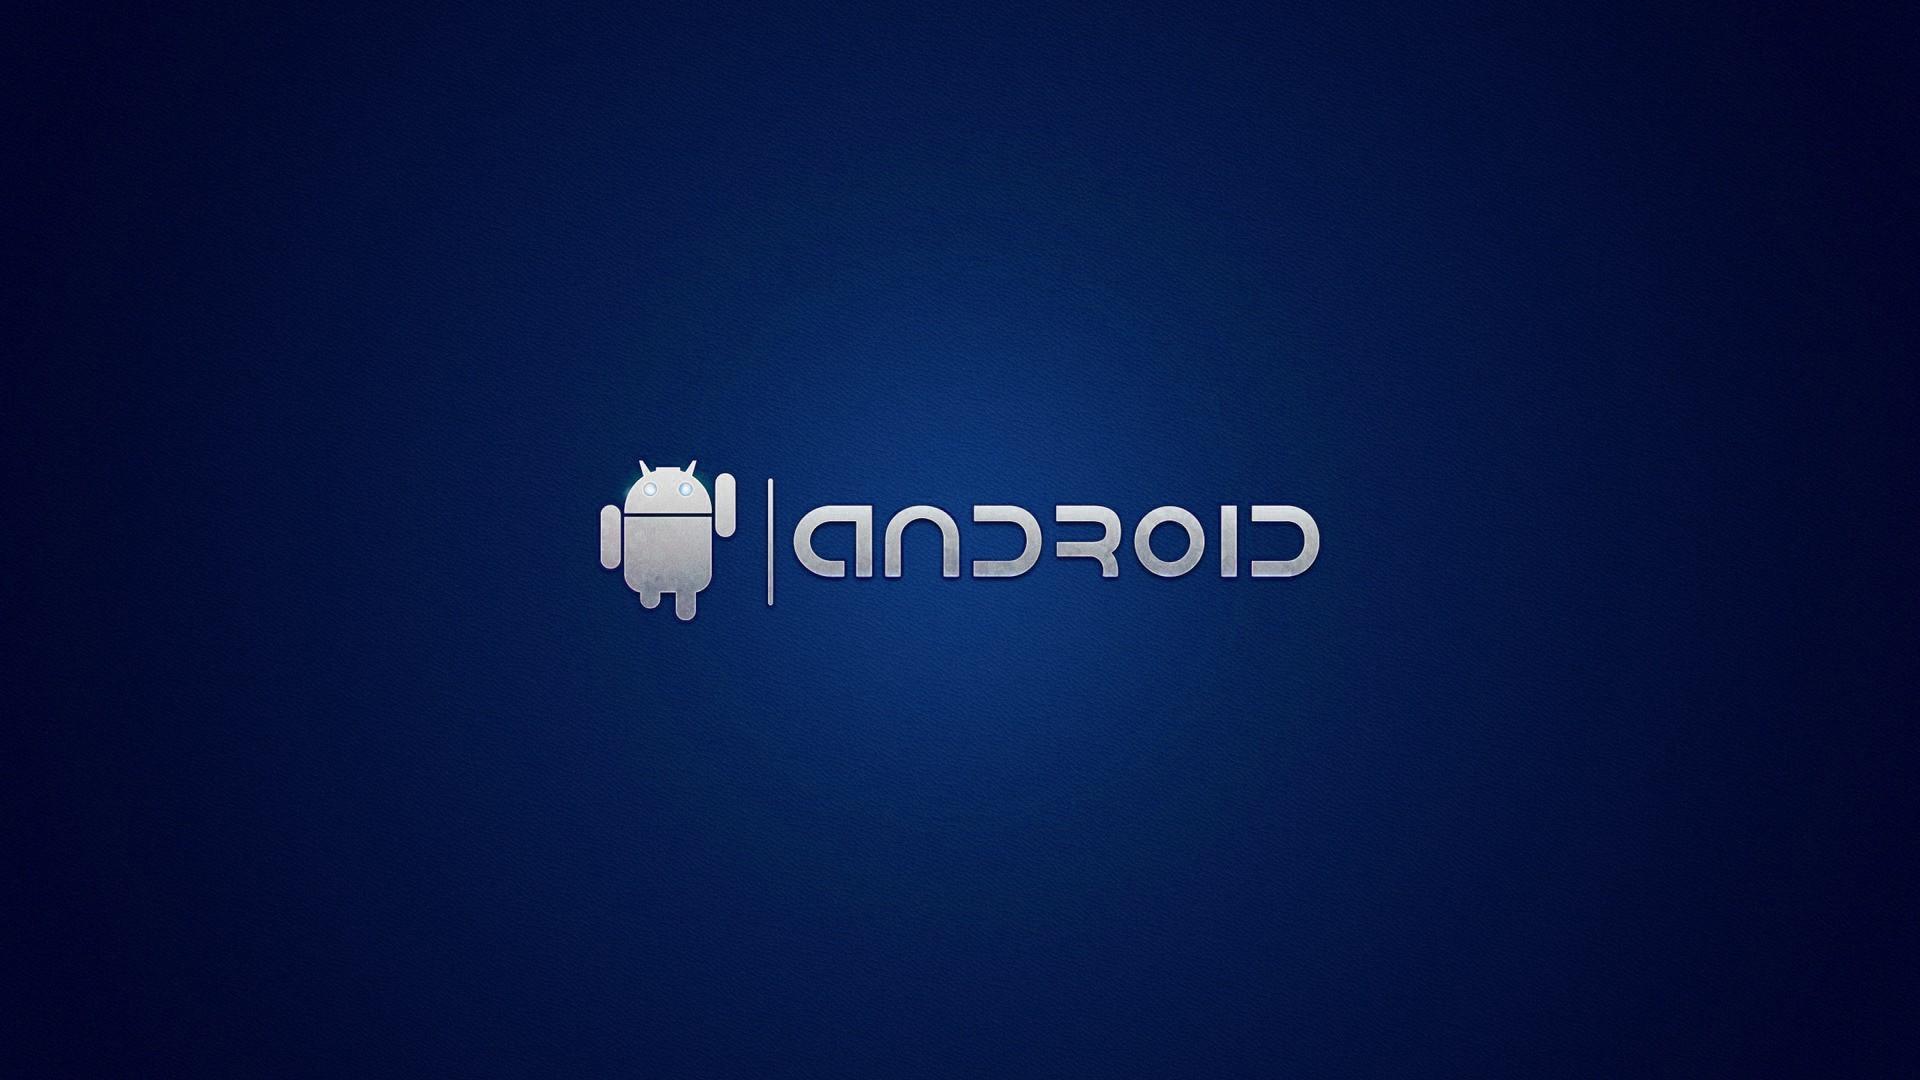 Blue android wallpaper 12320 PC en 1920x1080